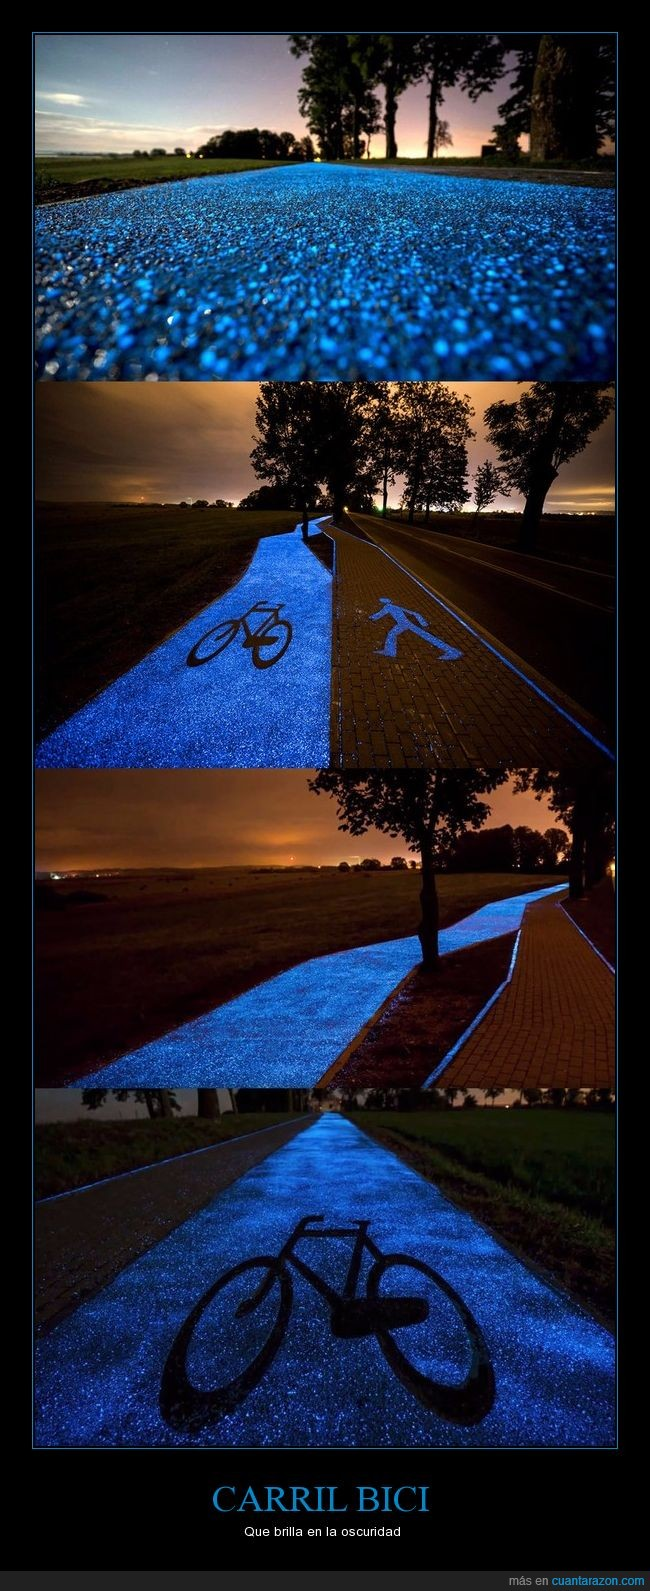 brillar,carril bici,genial idea,polonia